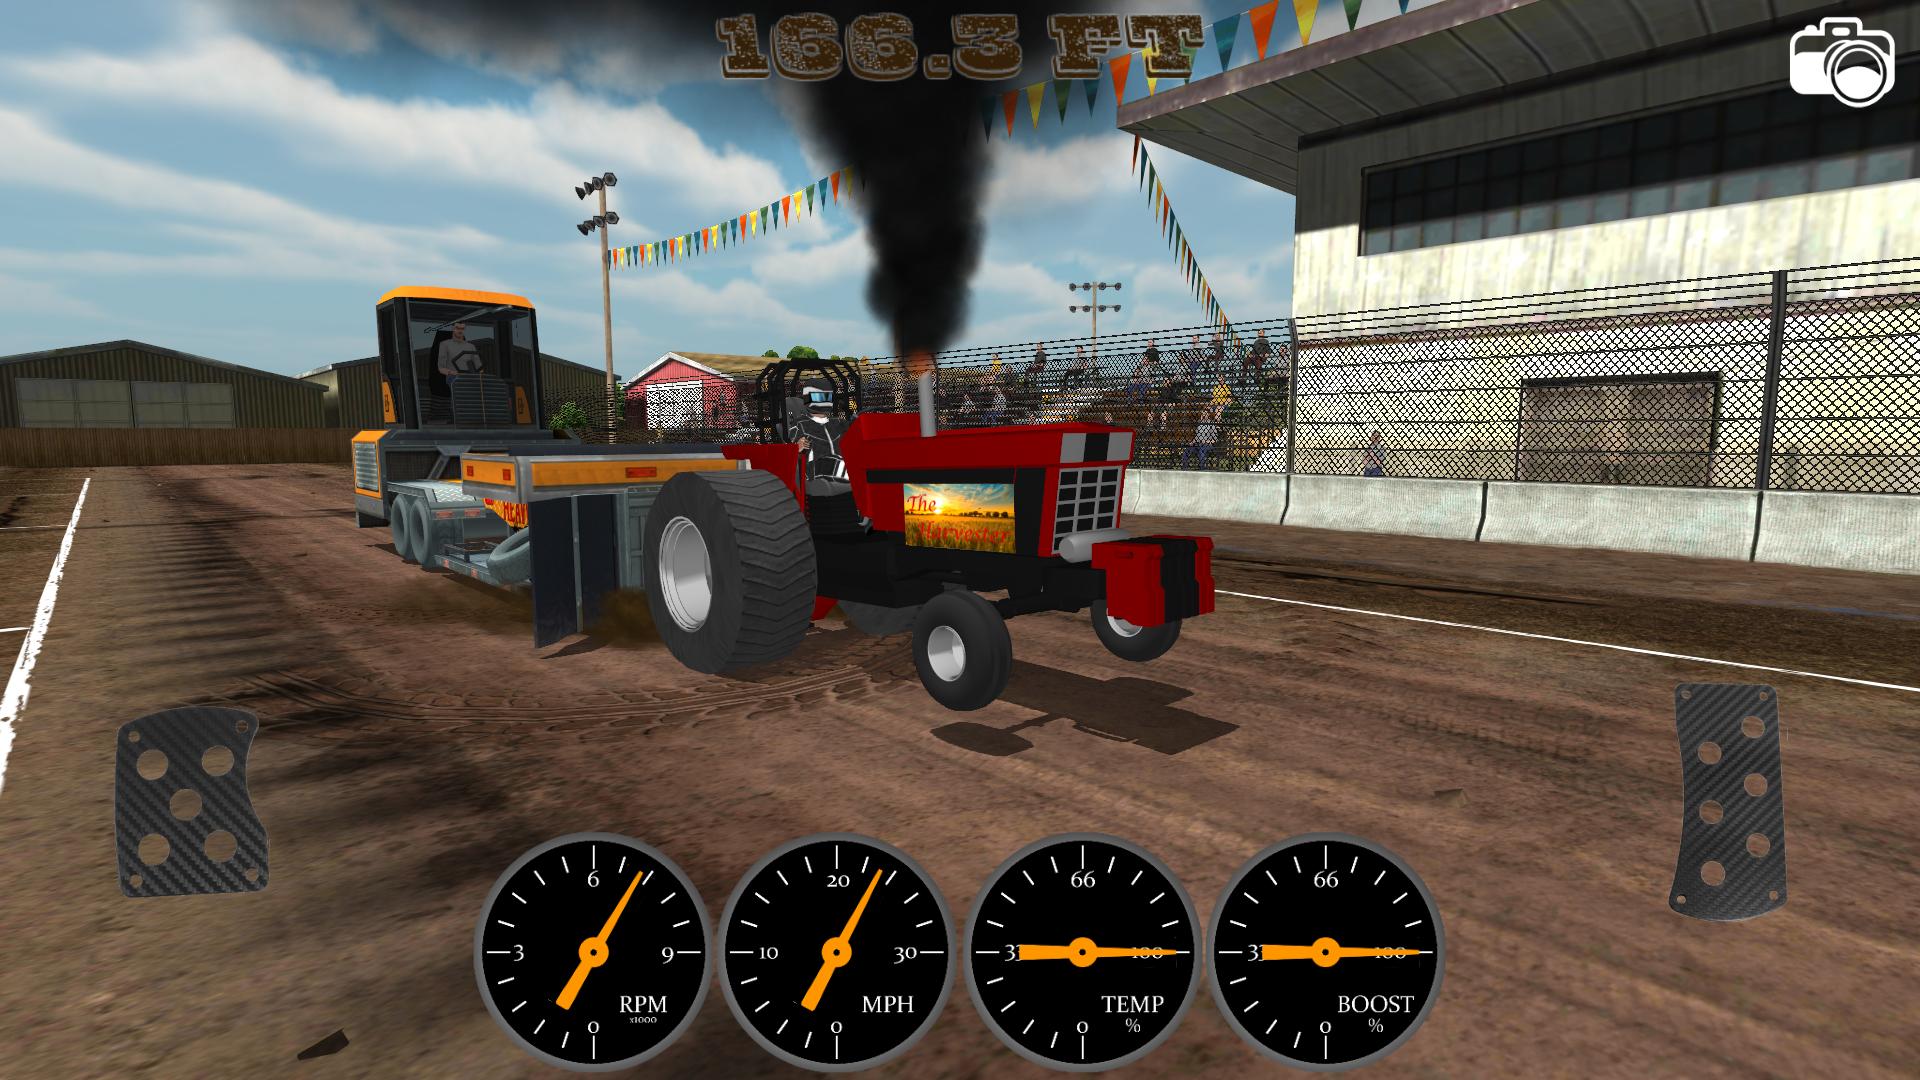 Playstation 2 tractor pulling games isle of capri casino and resort